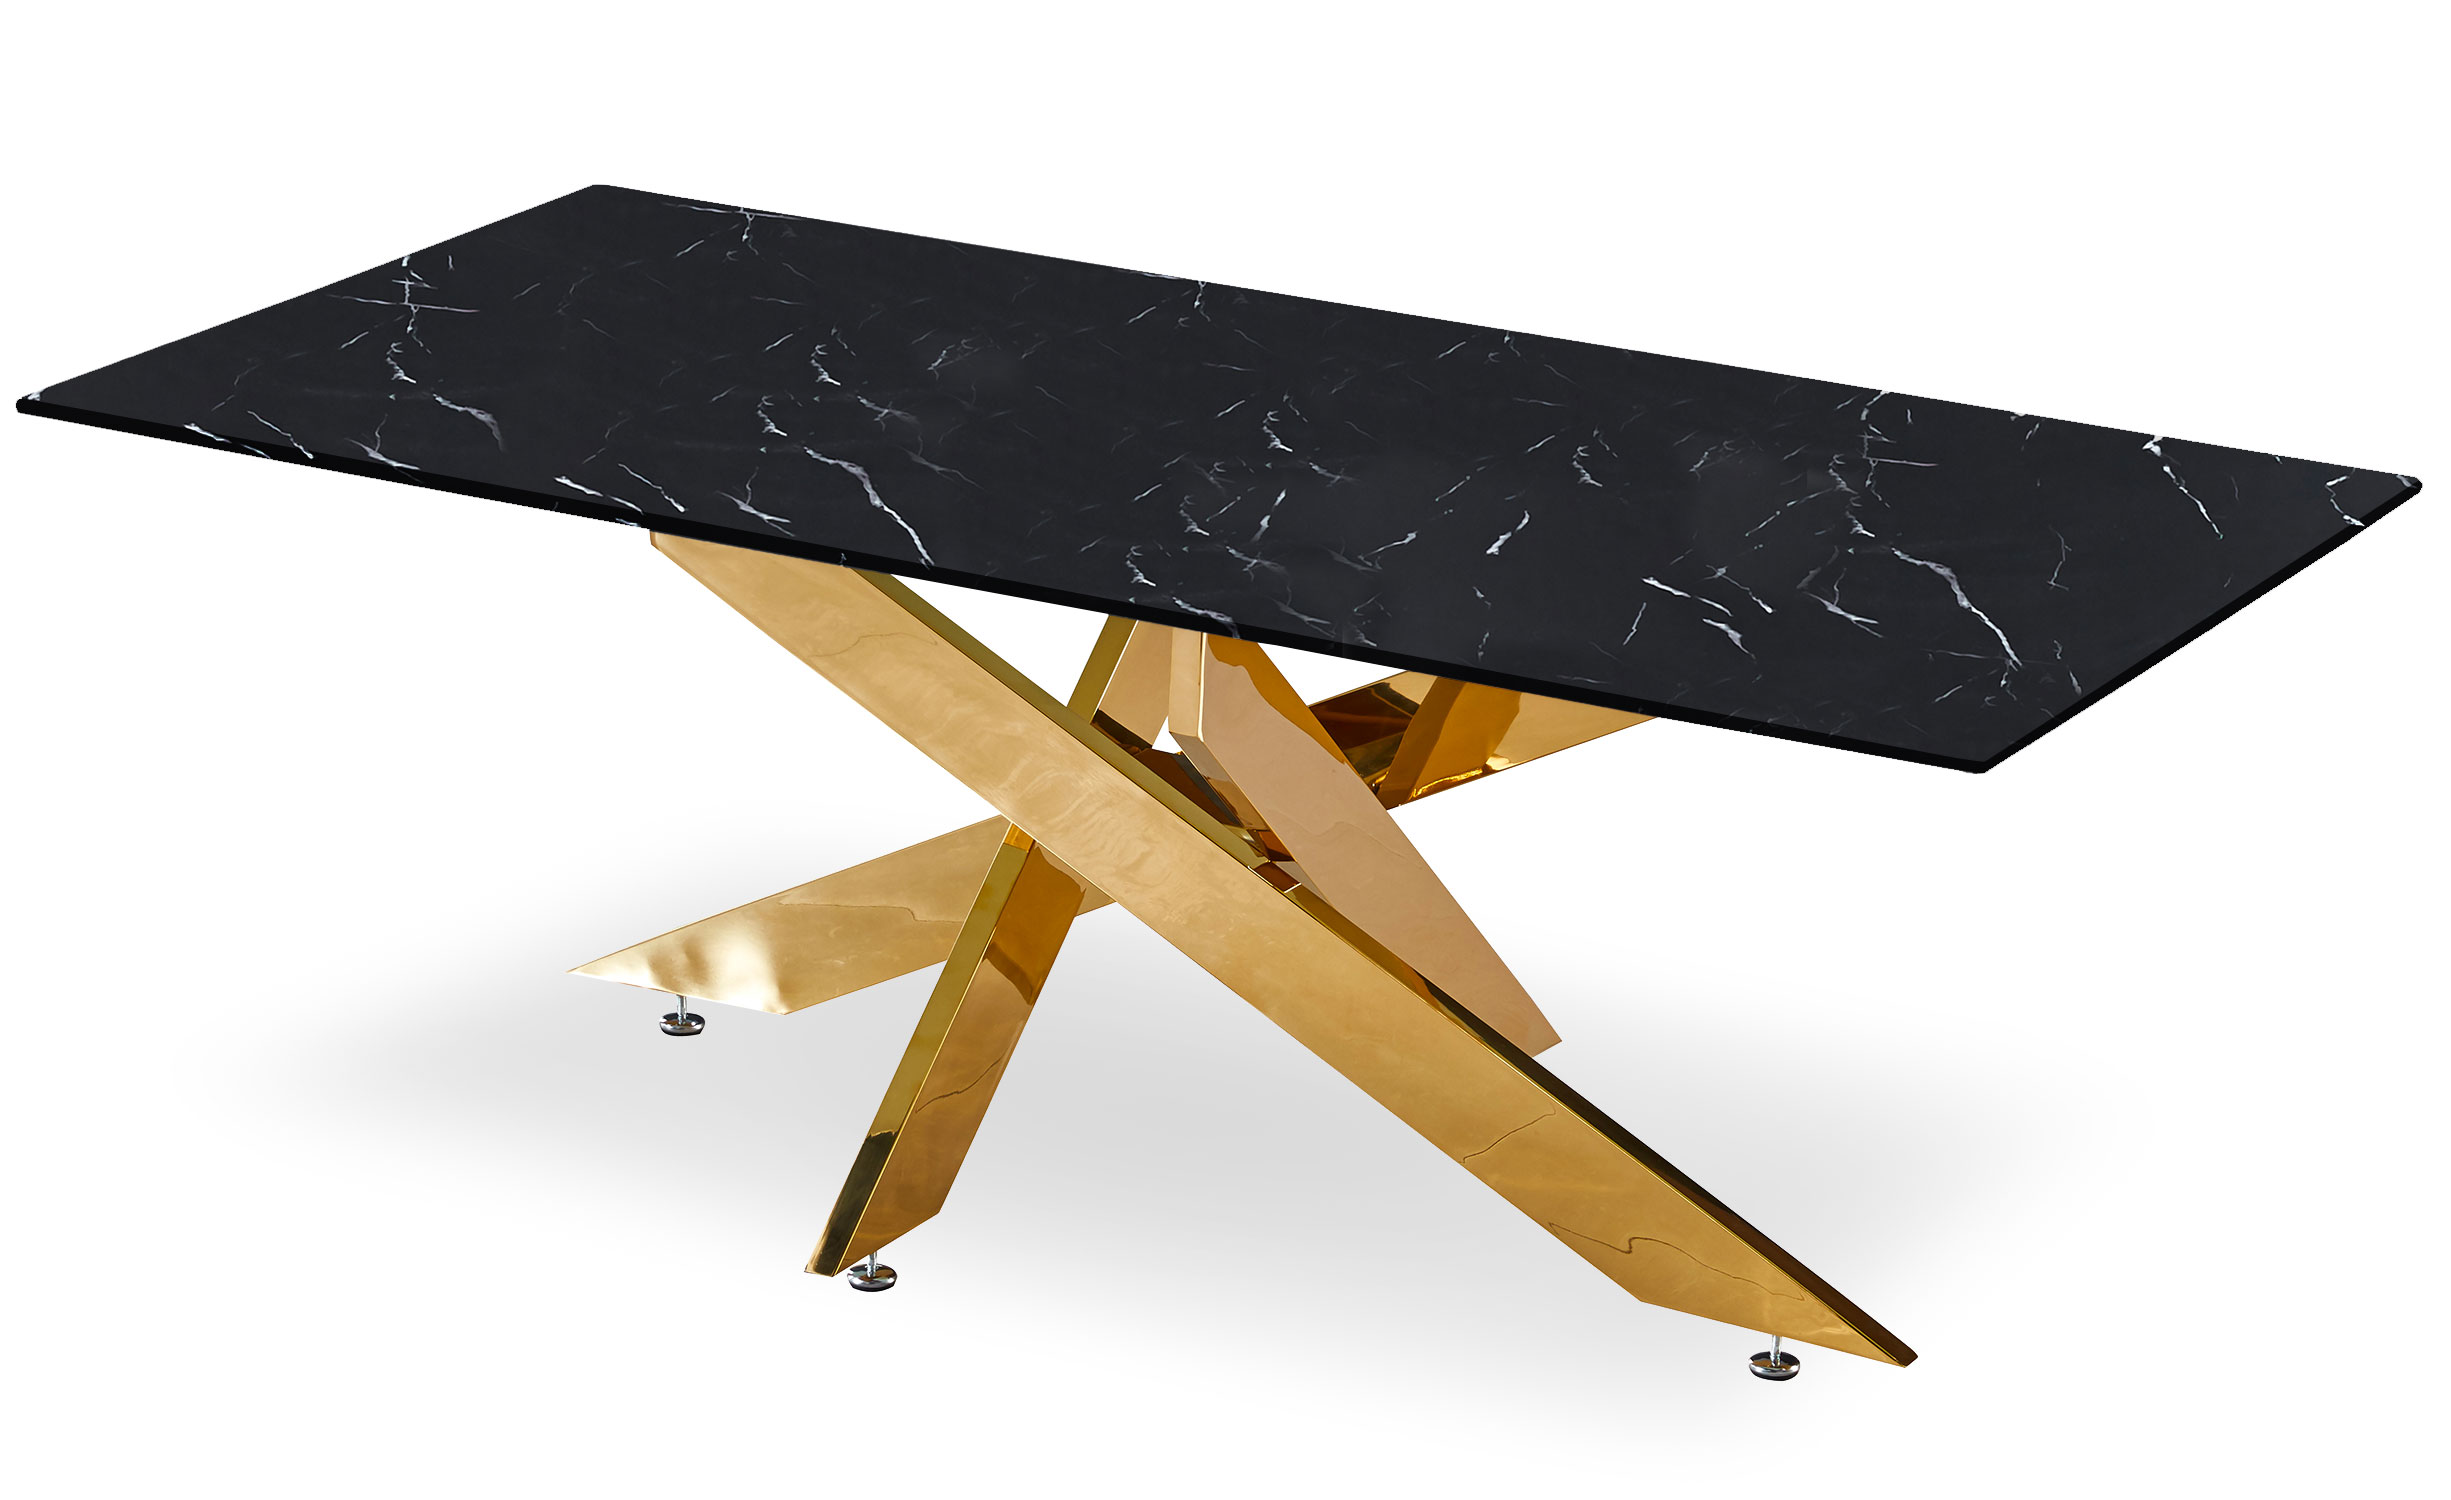 Naelle salontafel in zwart marmer en gouden poten